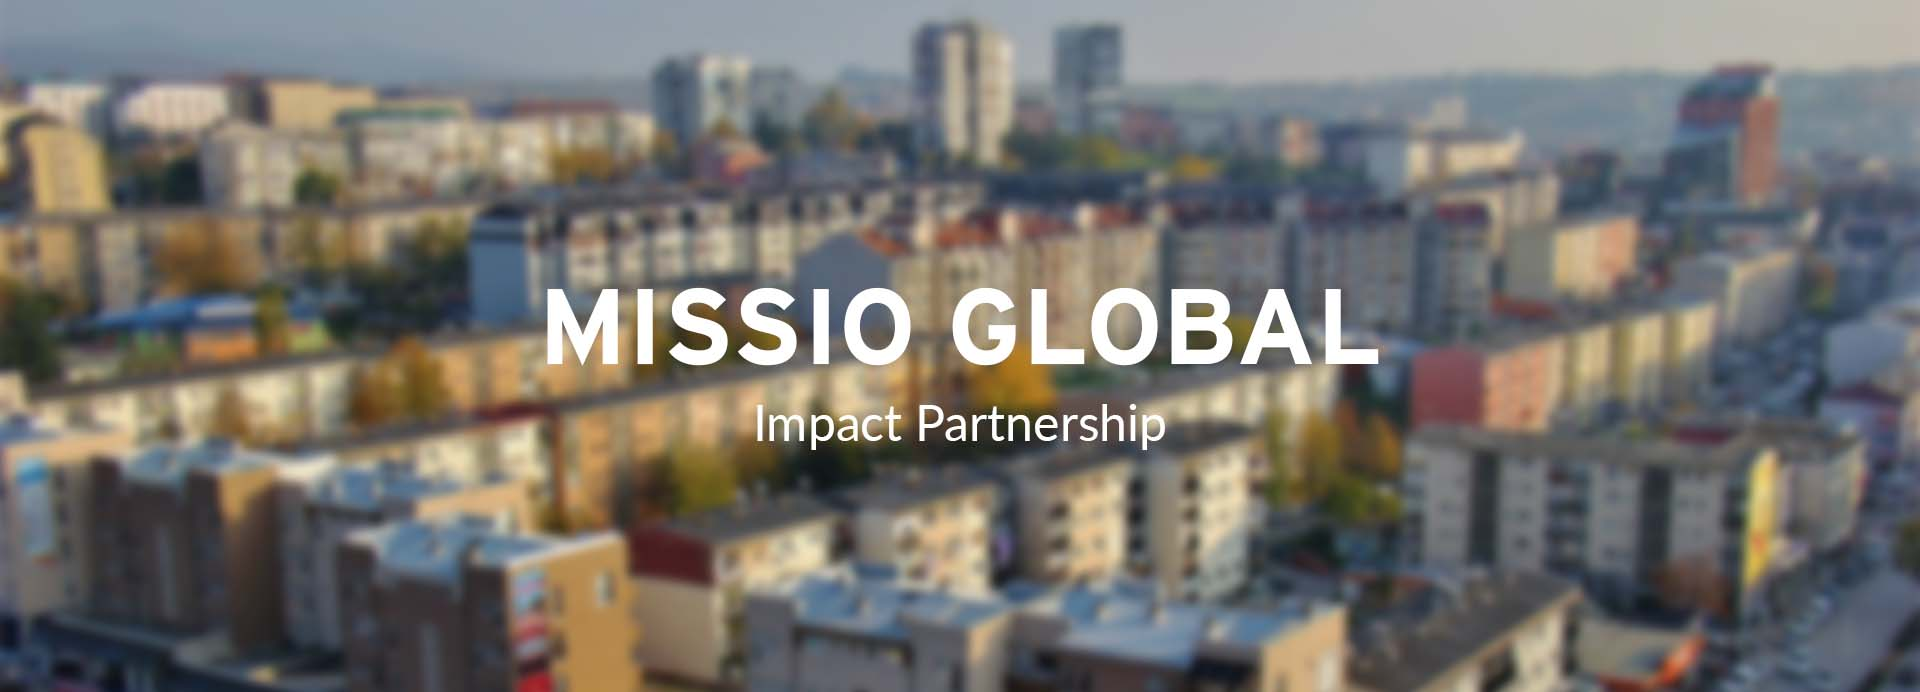 Impact Partnership Banner.jpg